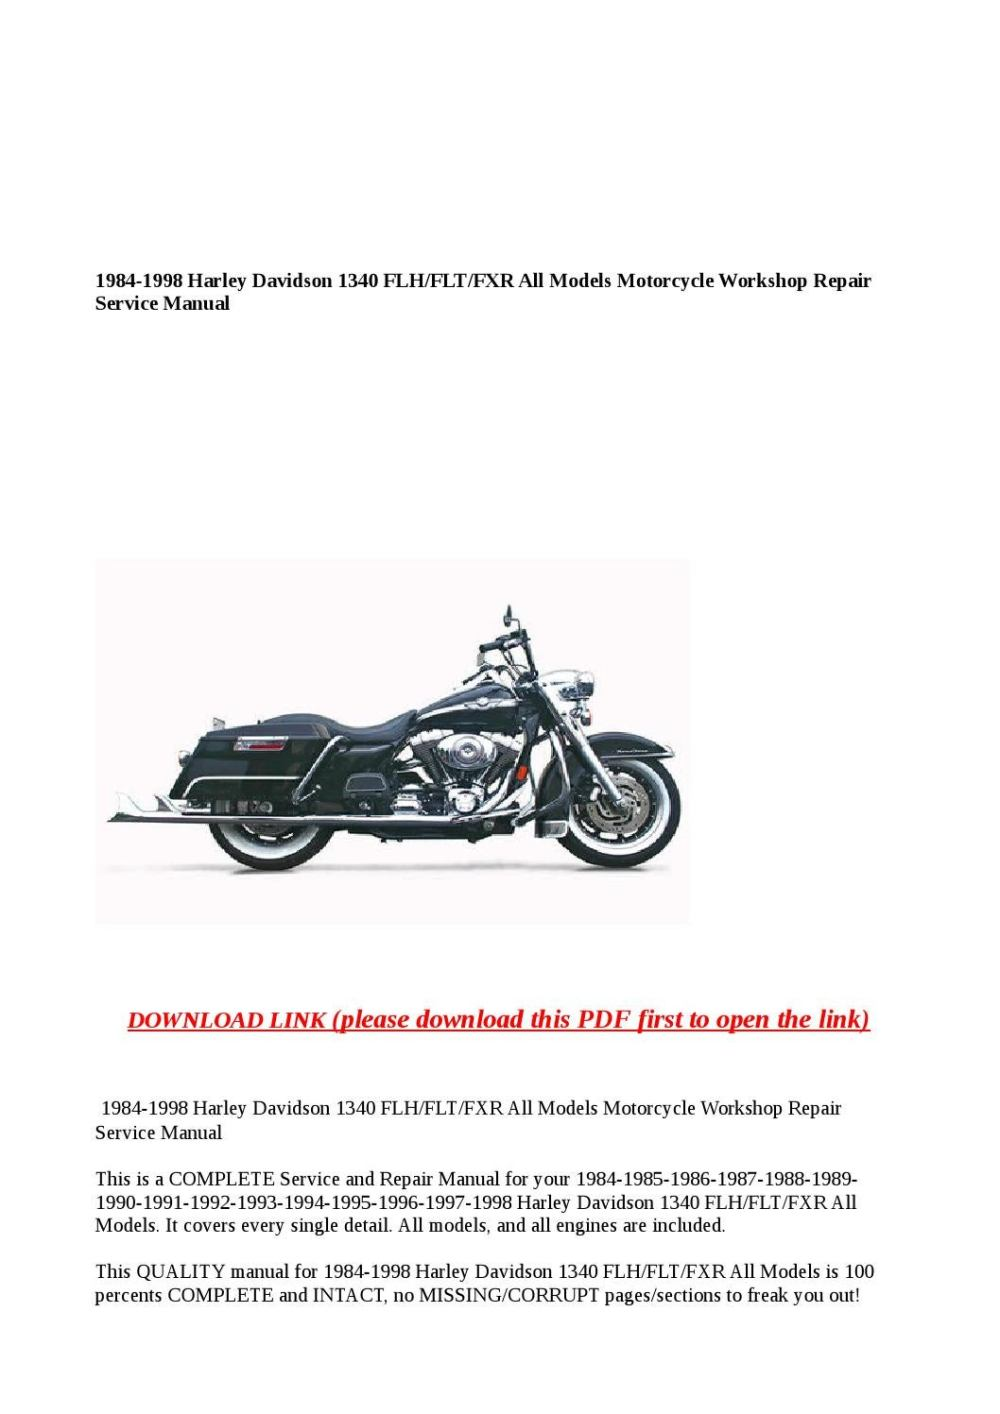 medium resolution of 1984 1998 harley davidson 1340 flh flt fxr all models motorcycle workshop repair service manual by